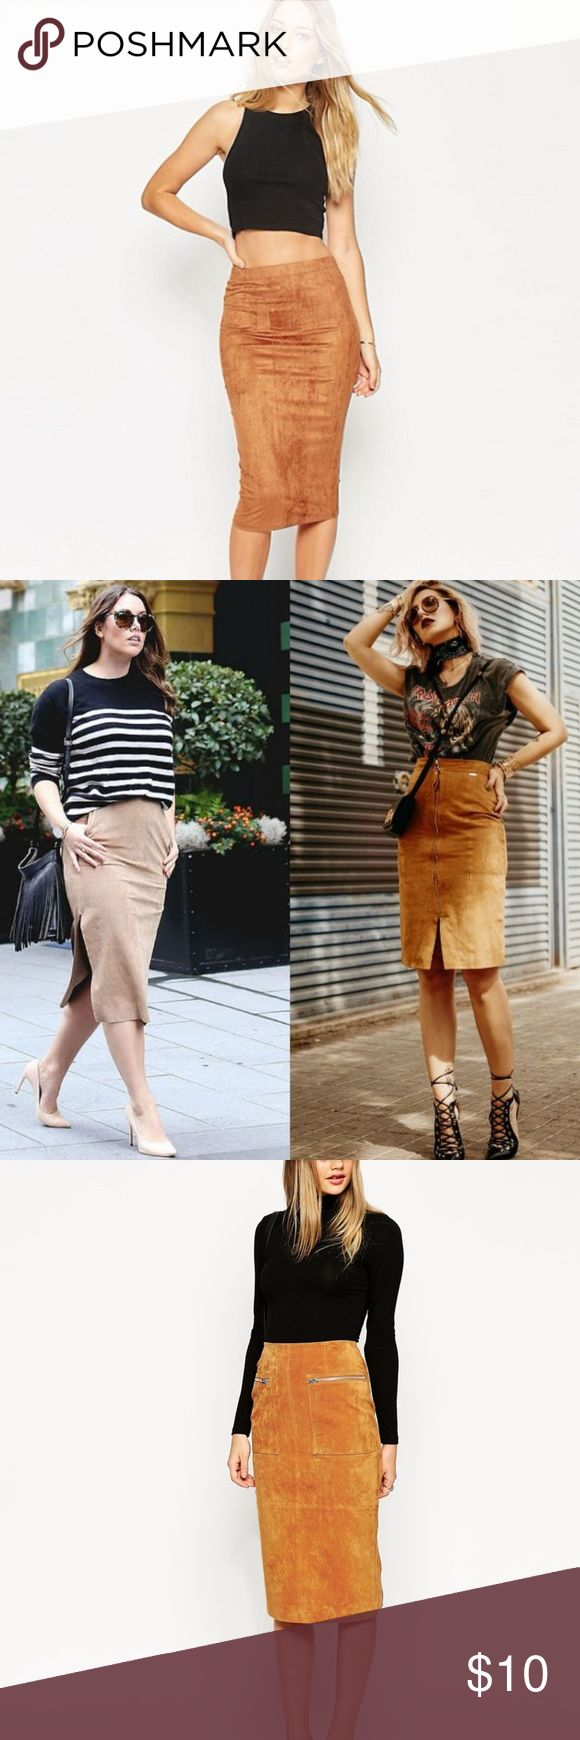 Knee Length Brown (camel) Skirt Knee Length Brown (camel) Skirt Alamos  Labeled